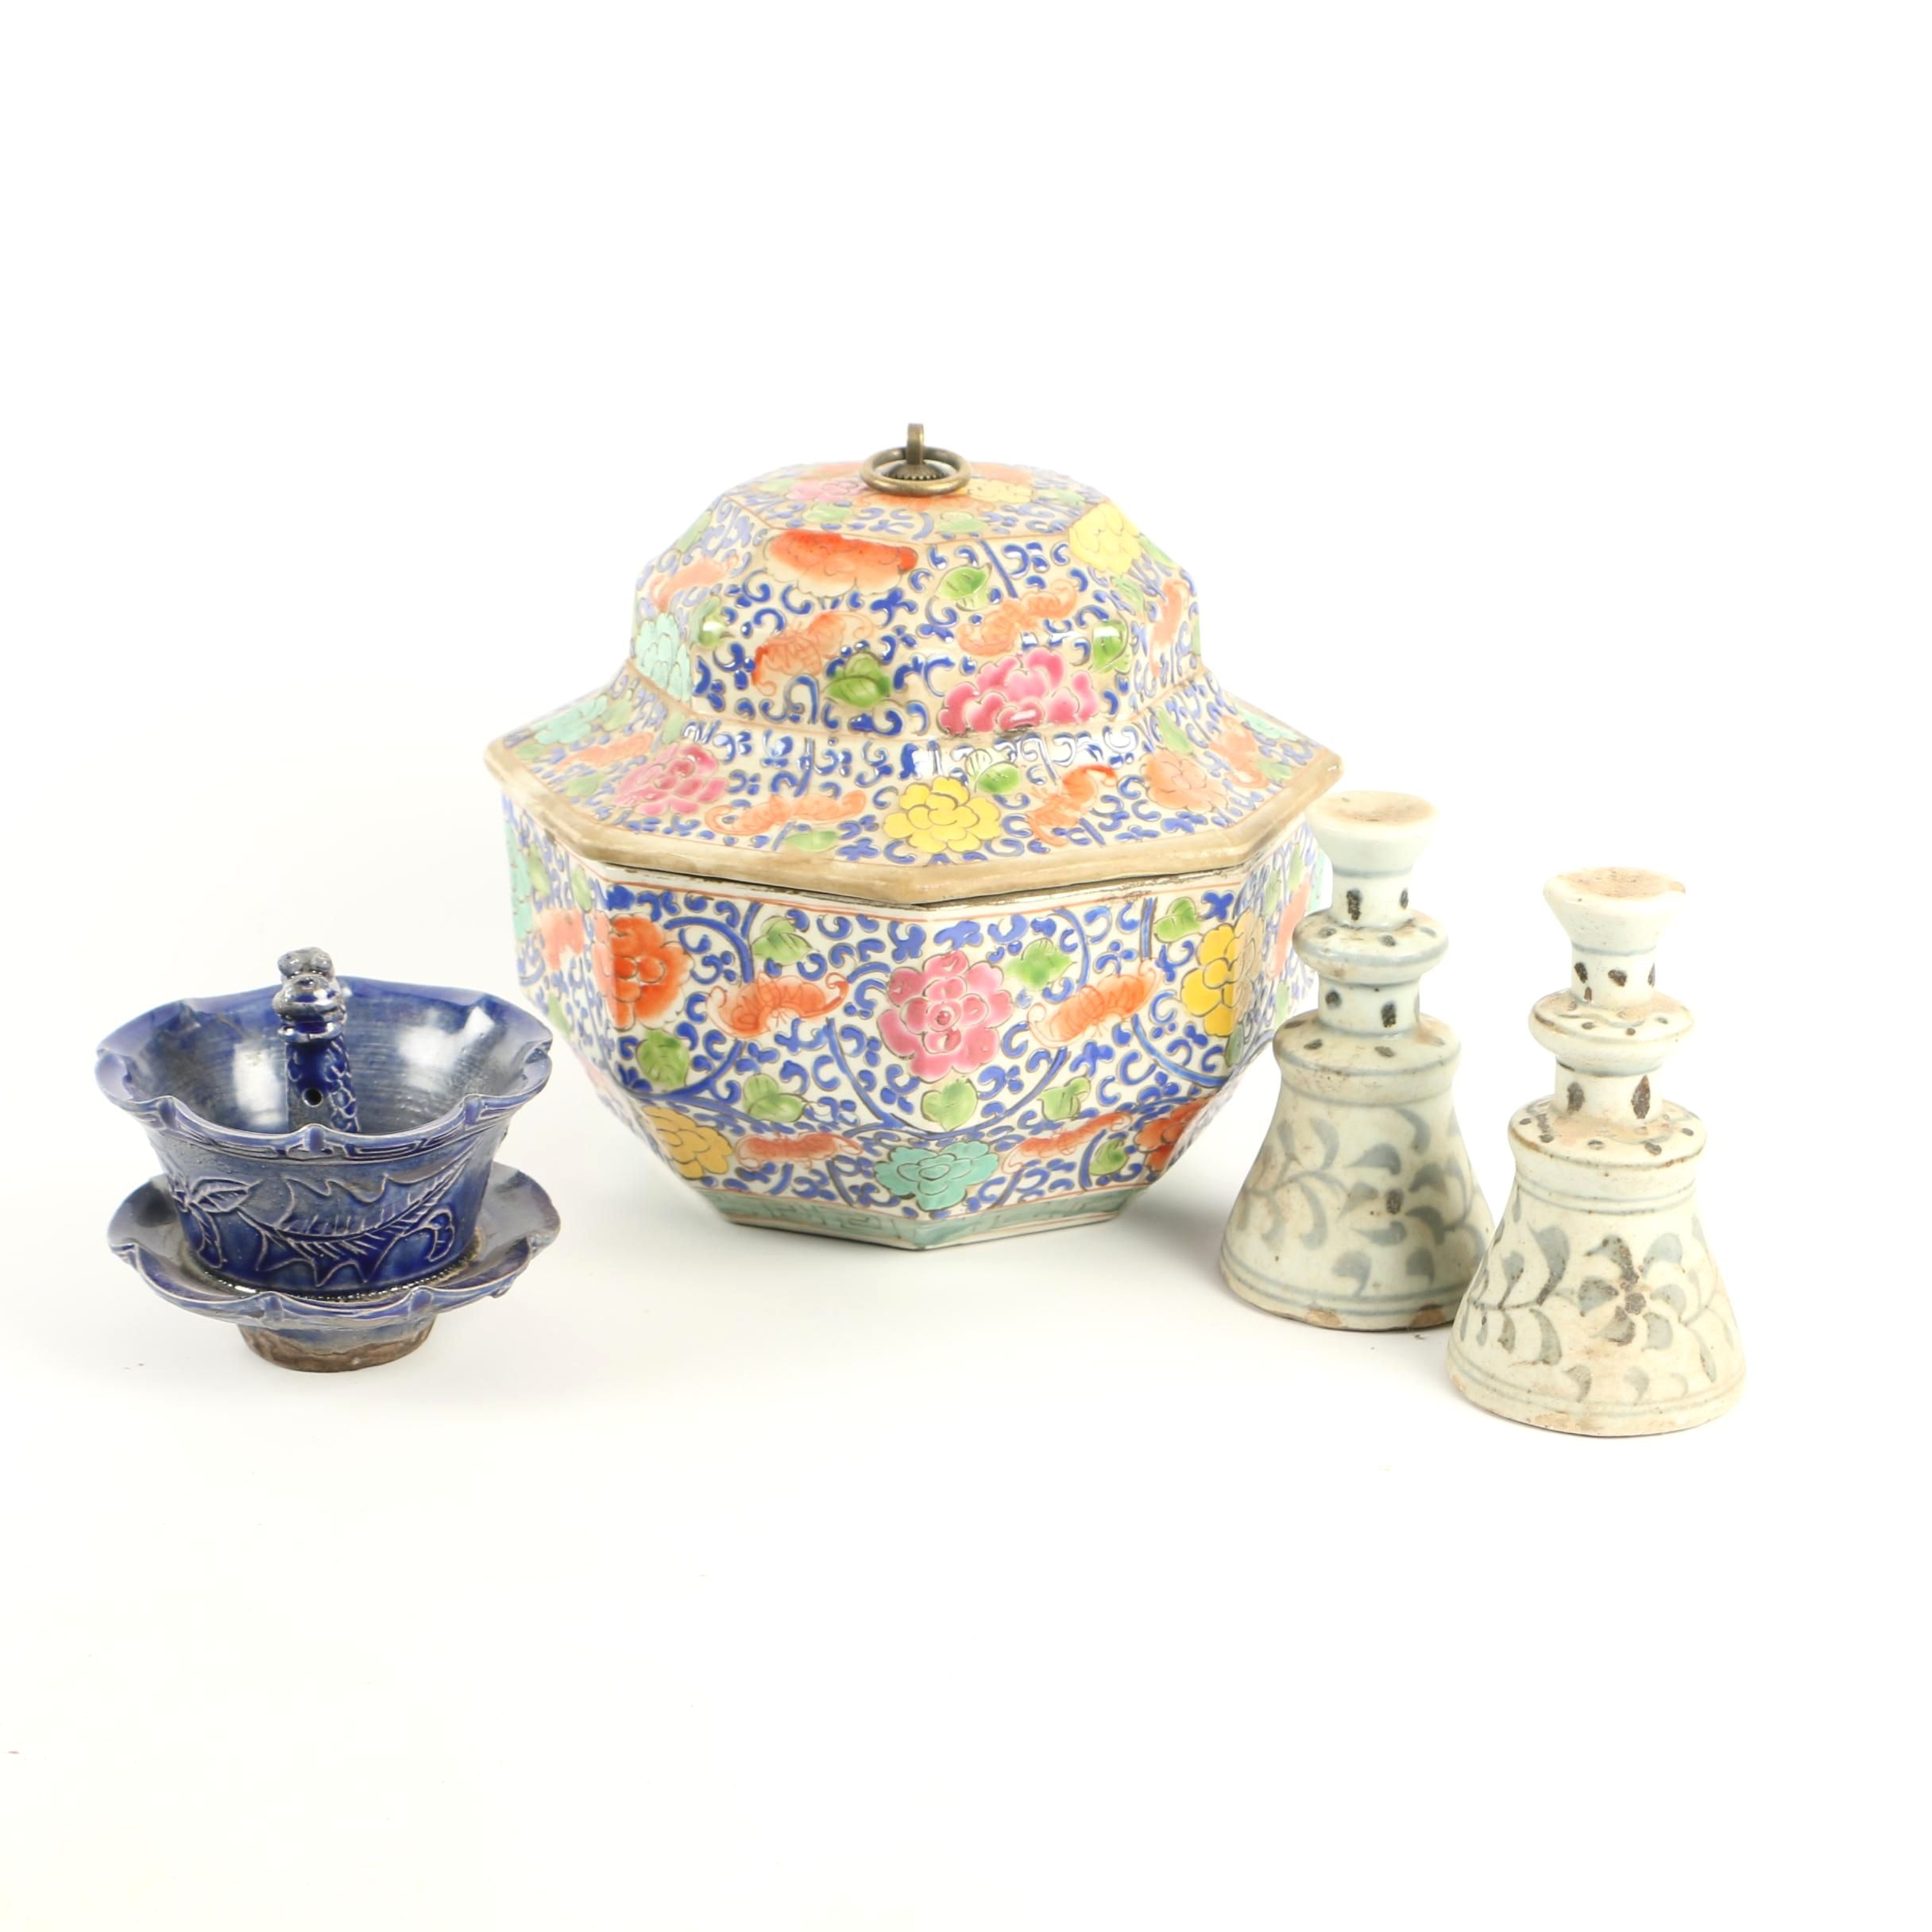 Chinese Hand-Painted Ceramic Jar and Decor